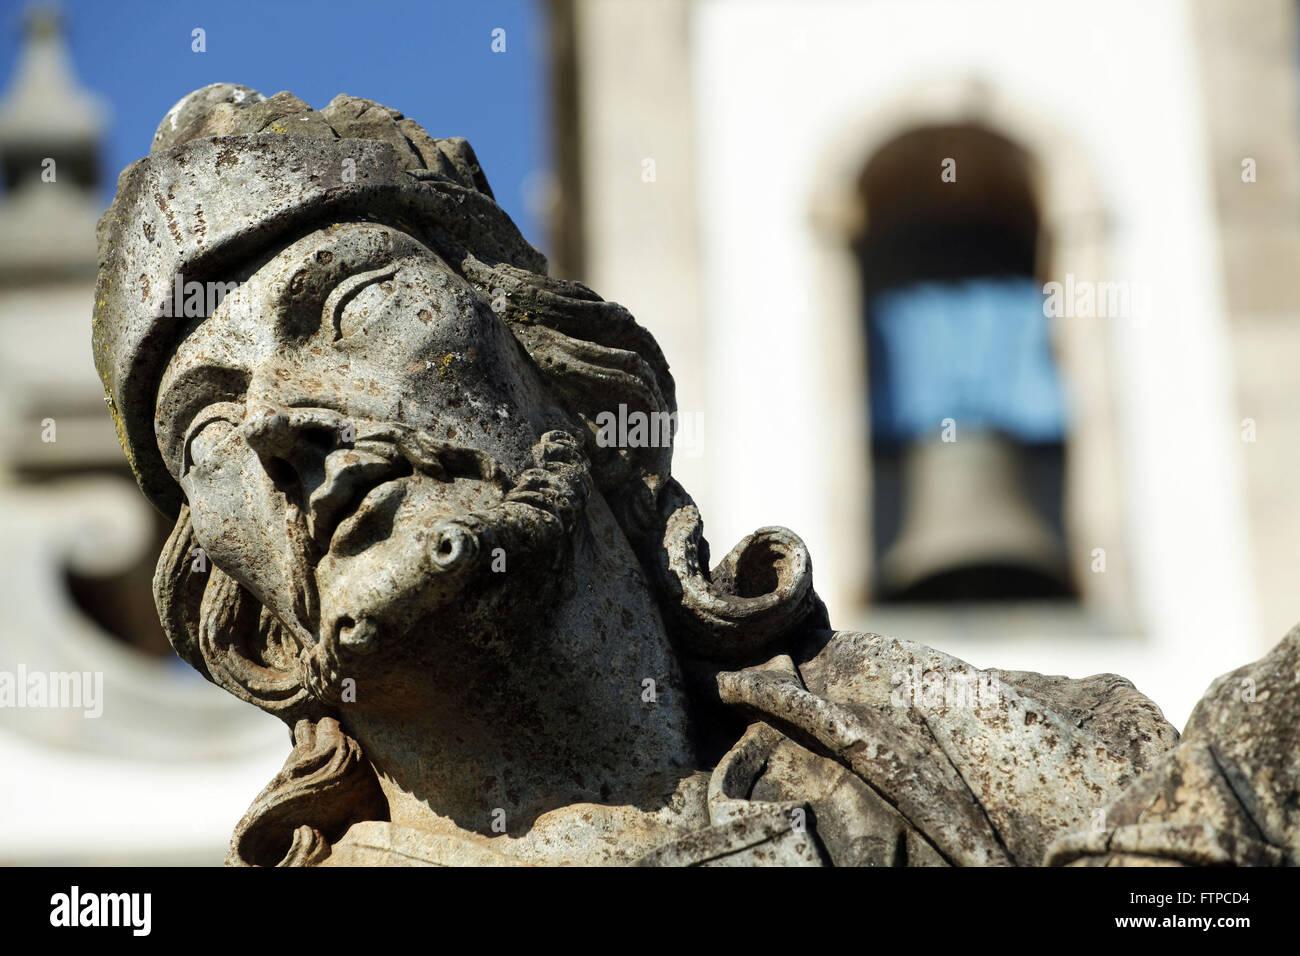 Prophet Ezekiel - sculpture carved by Aleijadinho the Basilica of Bom Jesus Matozinhos - Stock Image